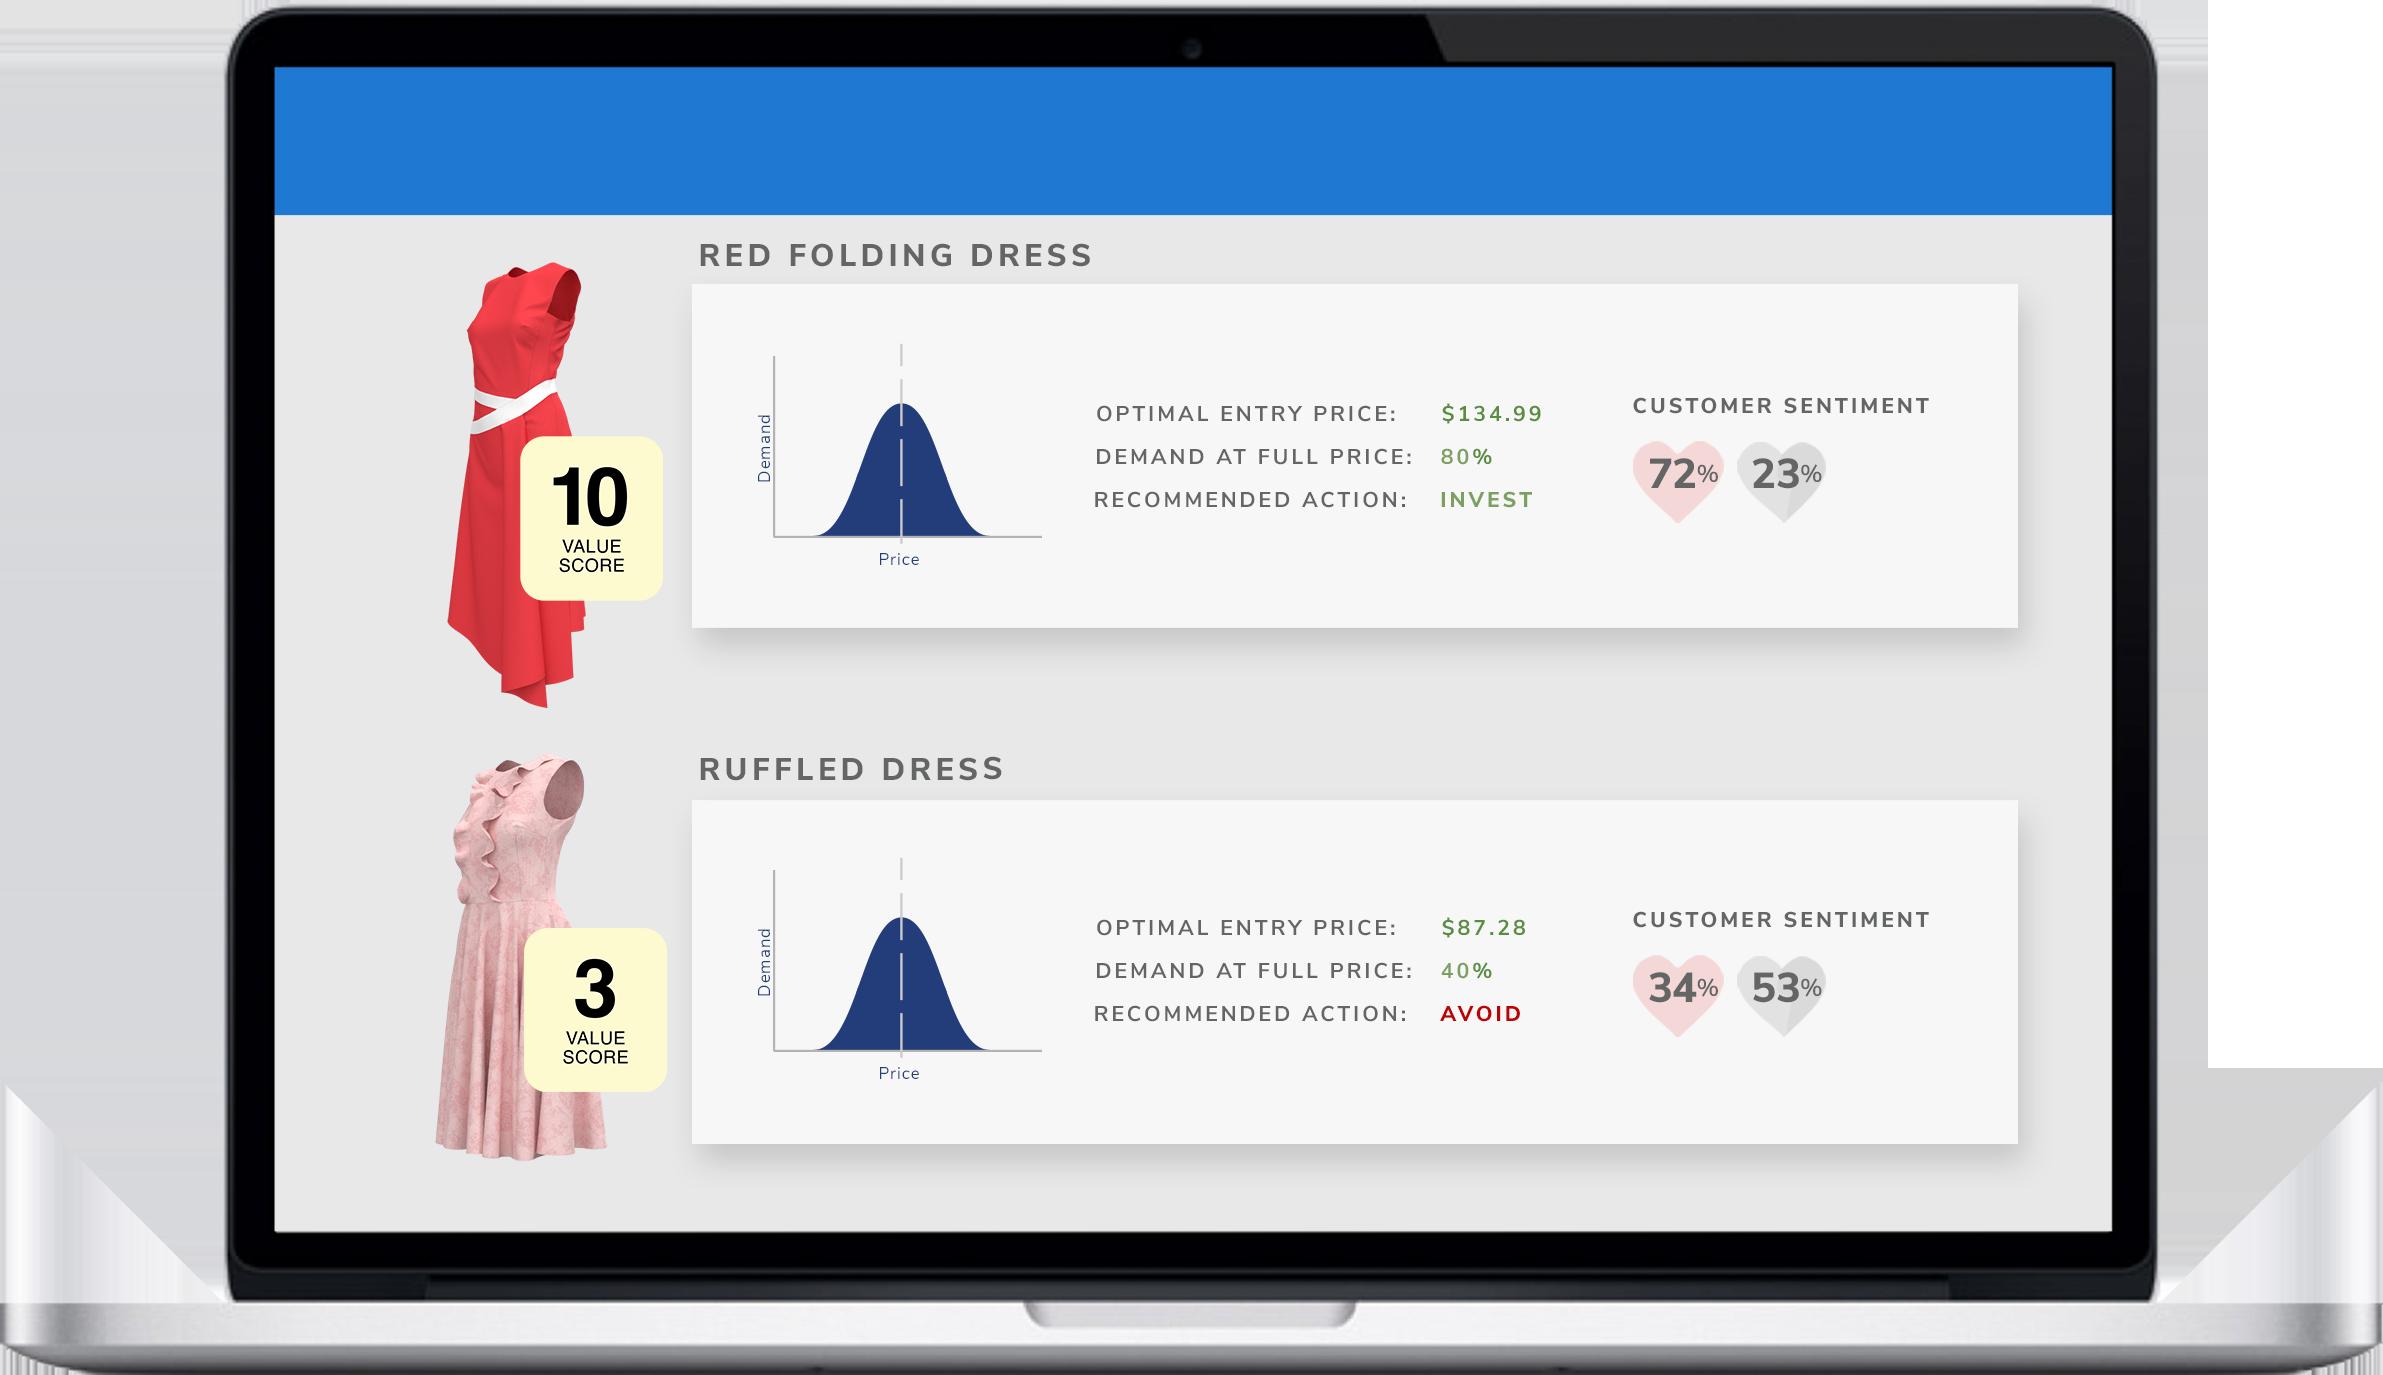 Results Screen Dresses - Mac Book